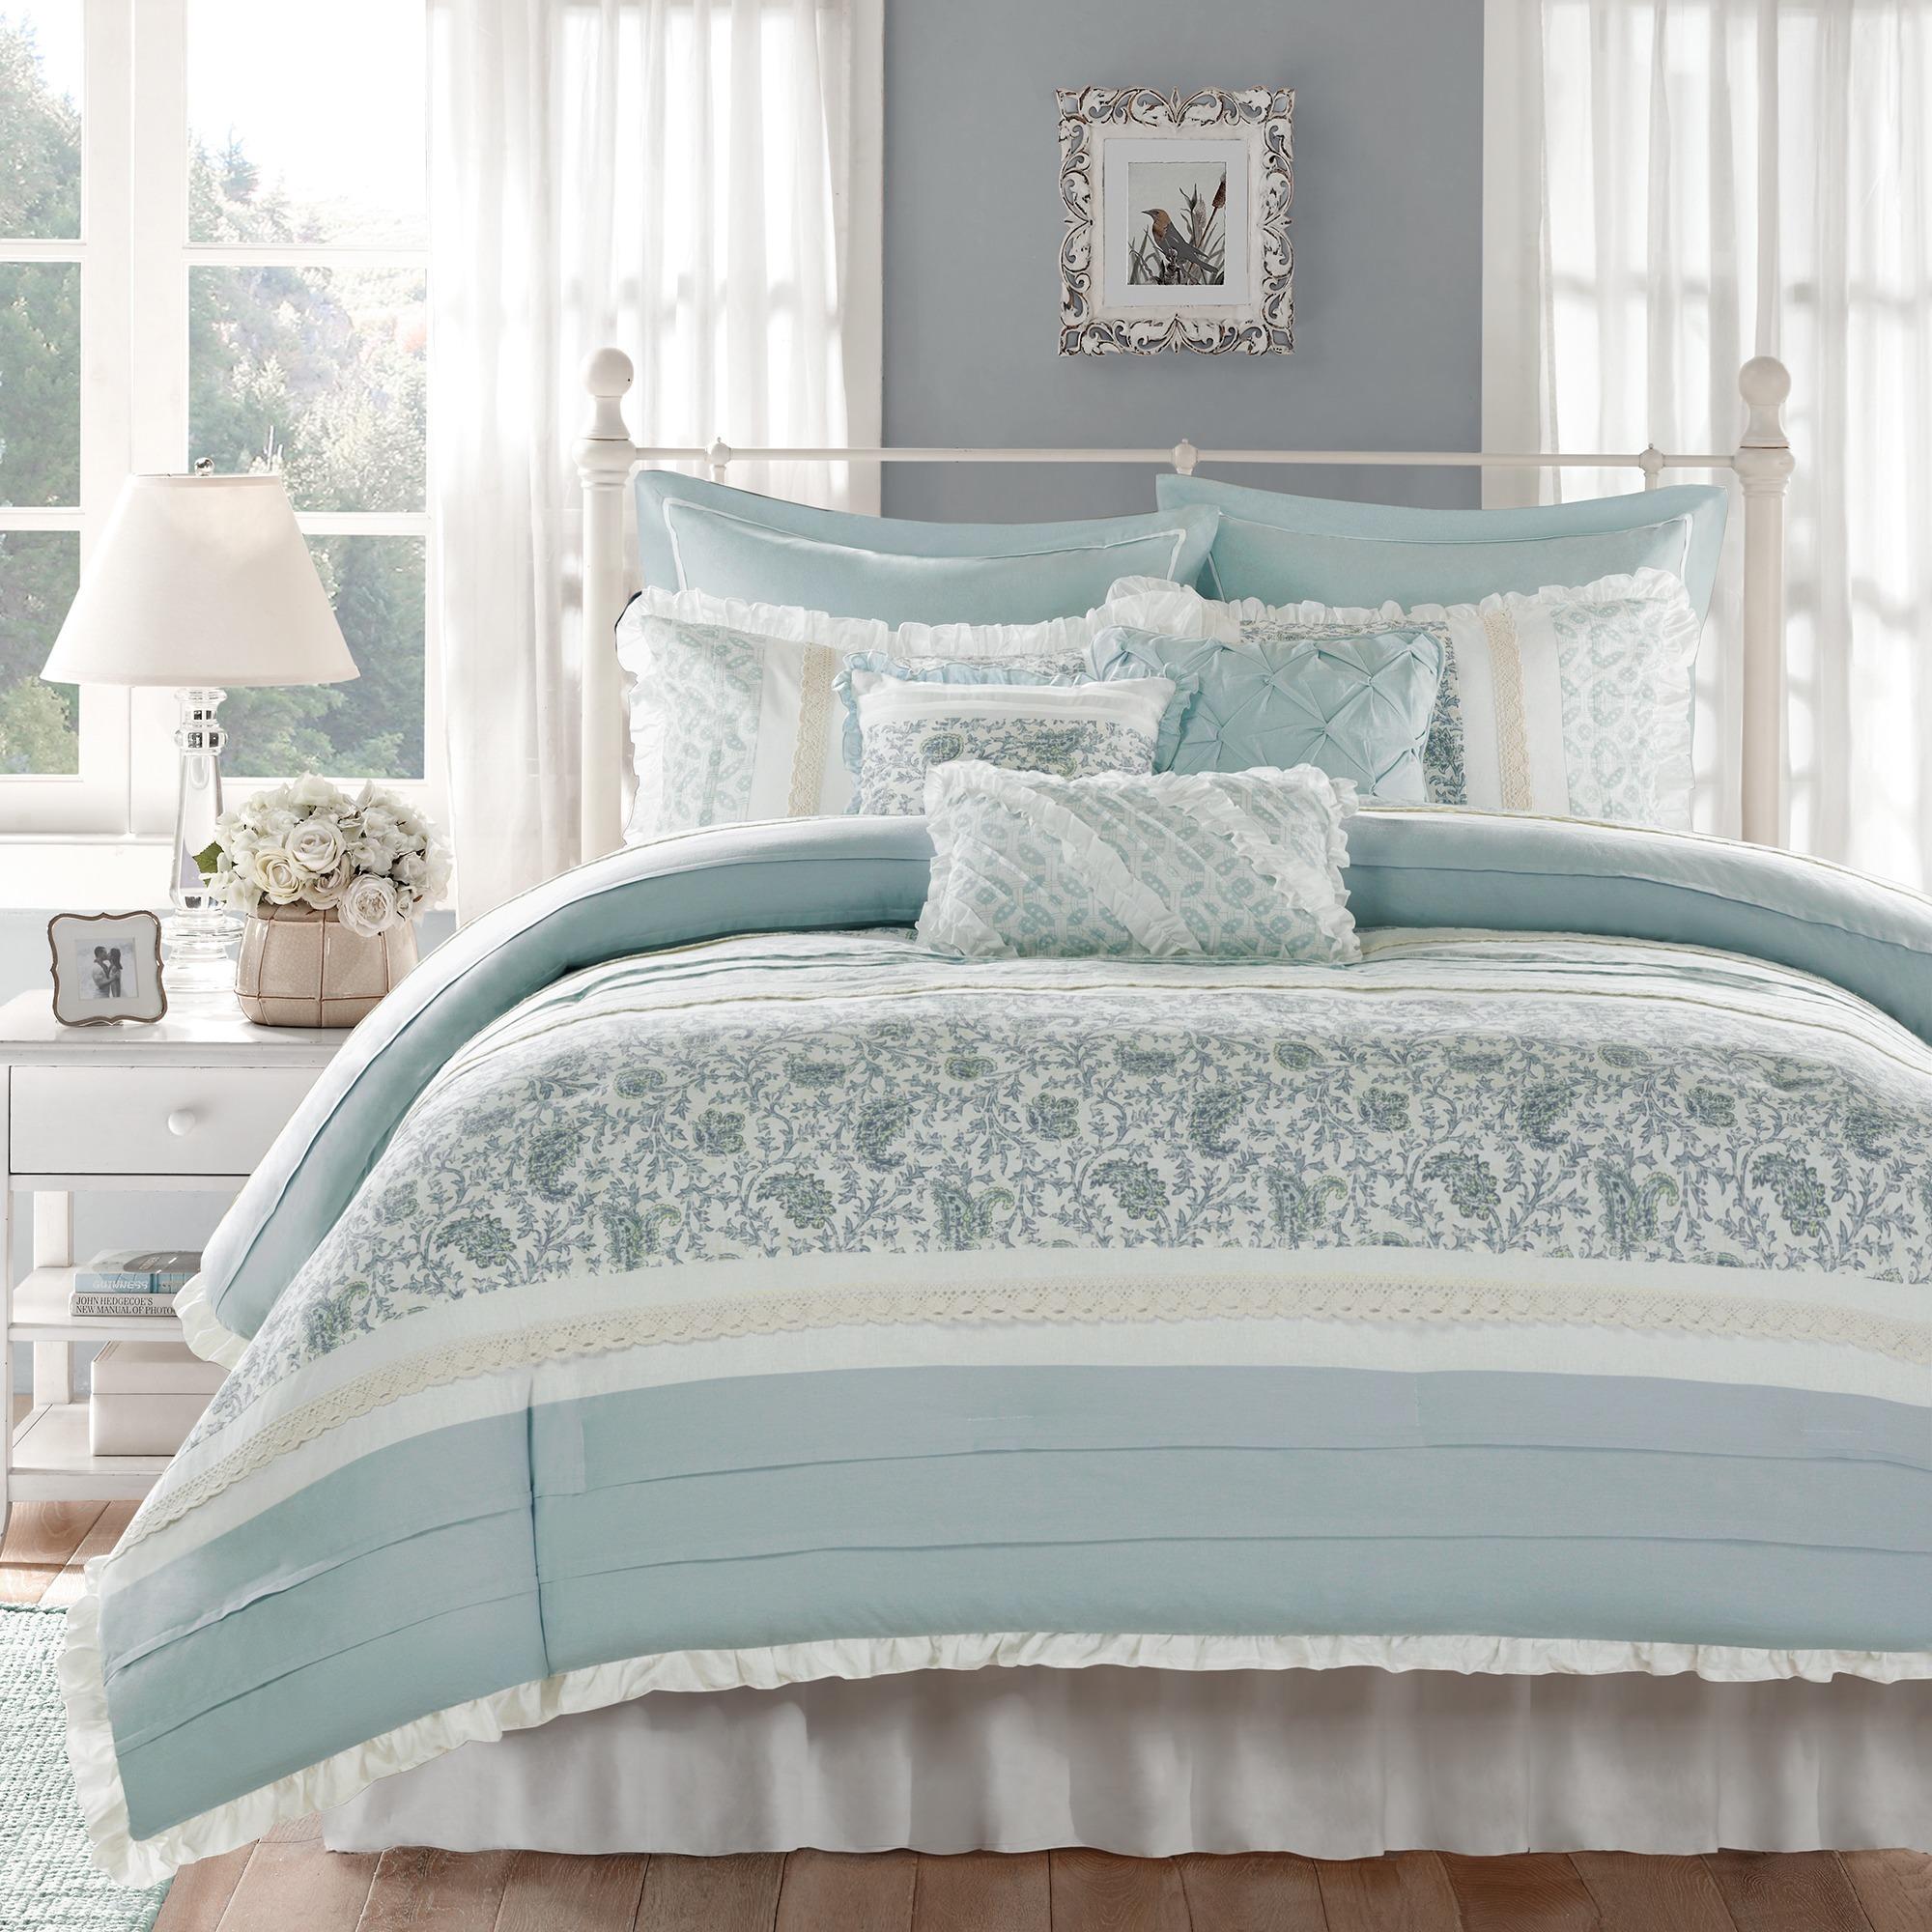 The Gray Barn Sleeping Hills 9-Piece Cotton Percale Comforter Set